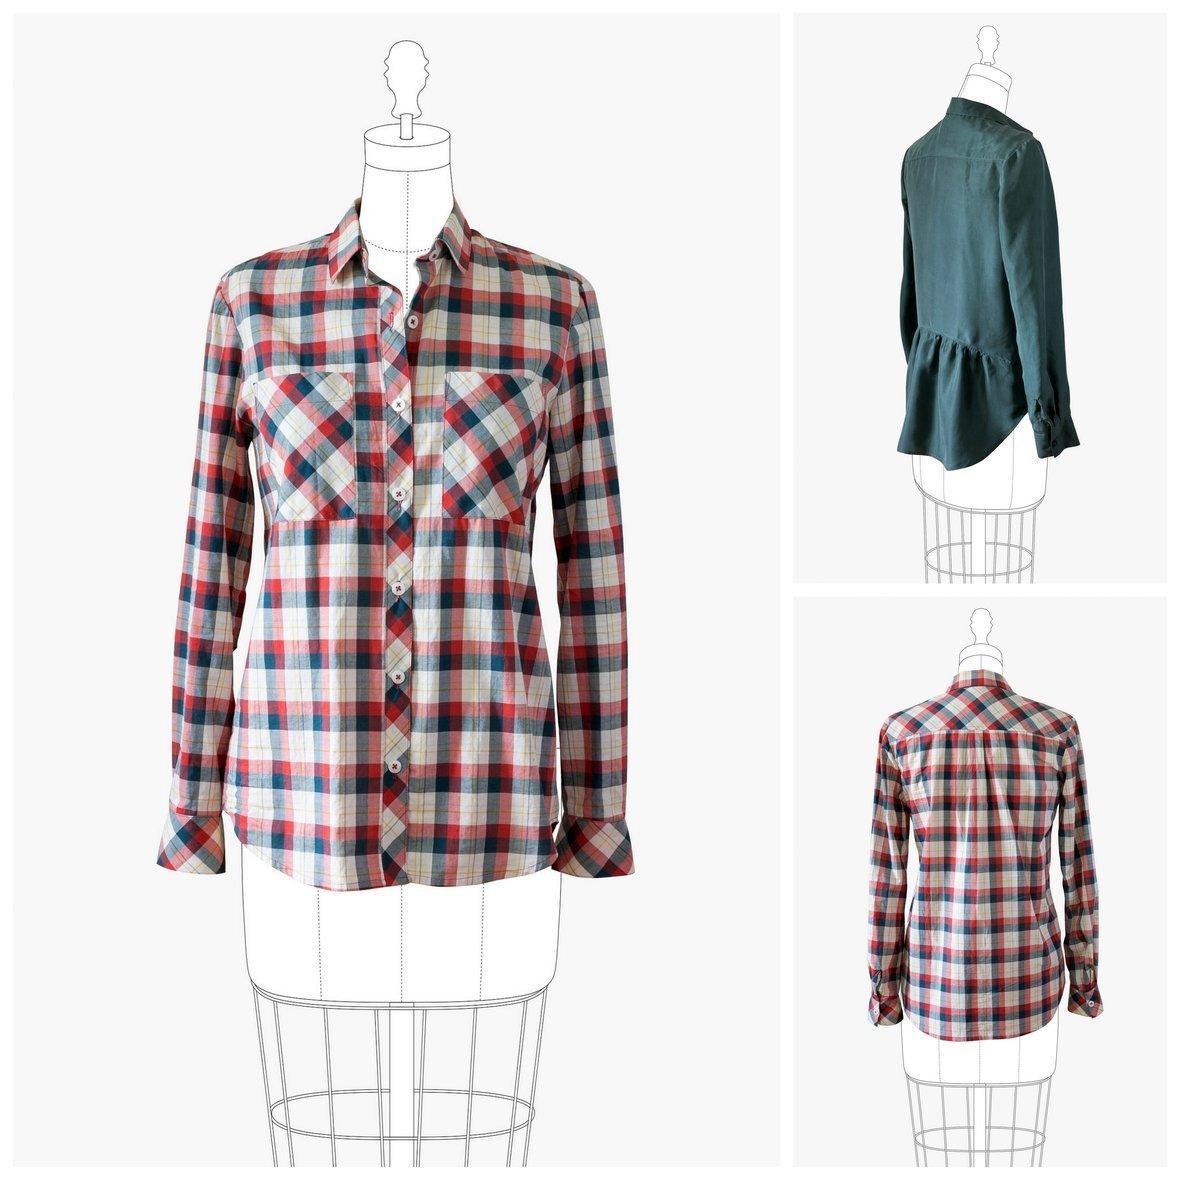 grainline studio  archer button up shirt sewing pattern